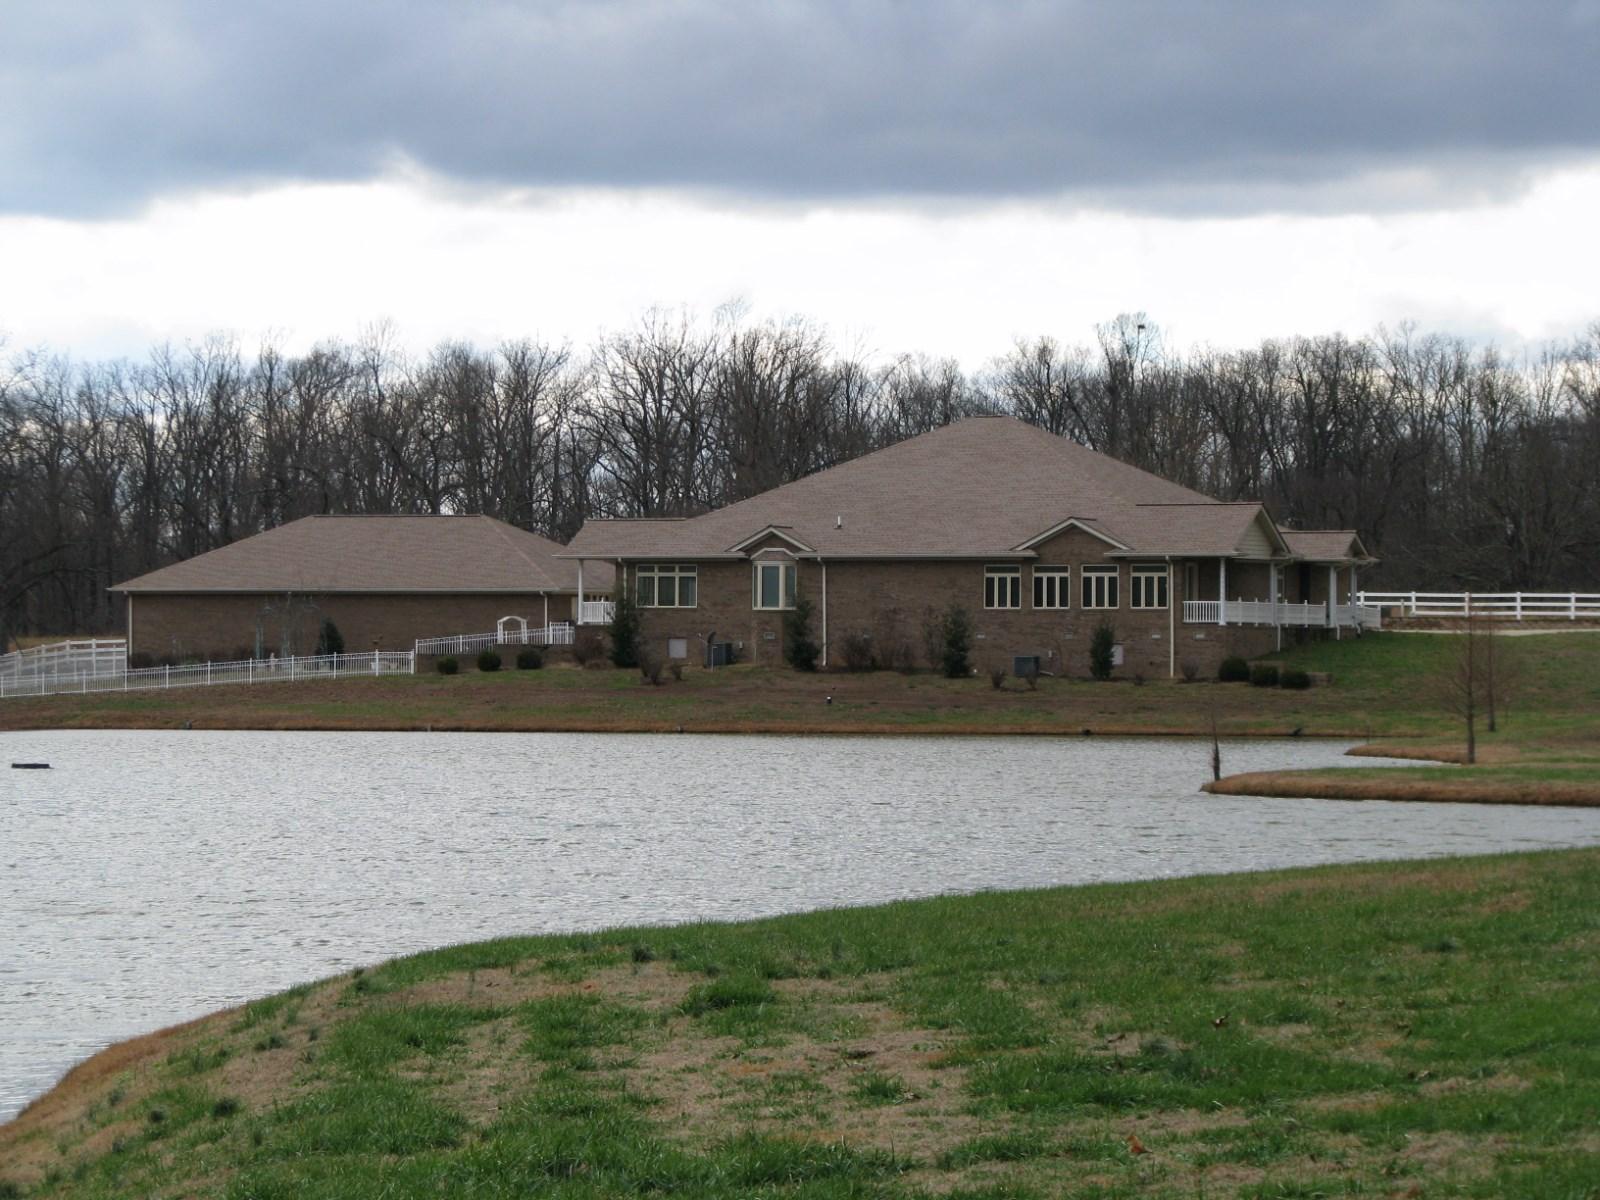 261 Stone Bridge, Benton, Kentucky 42025